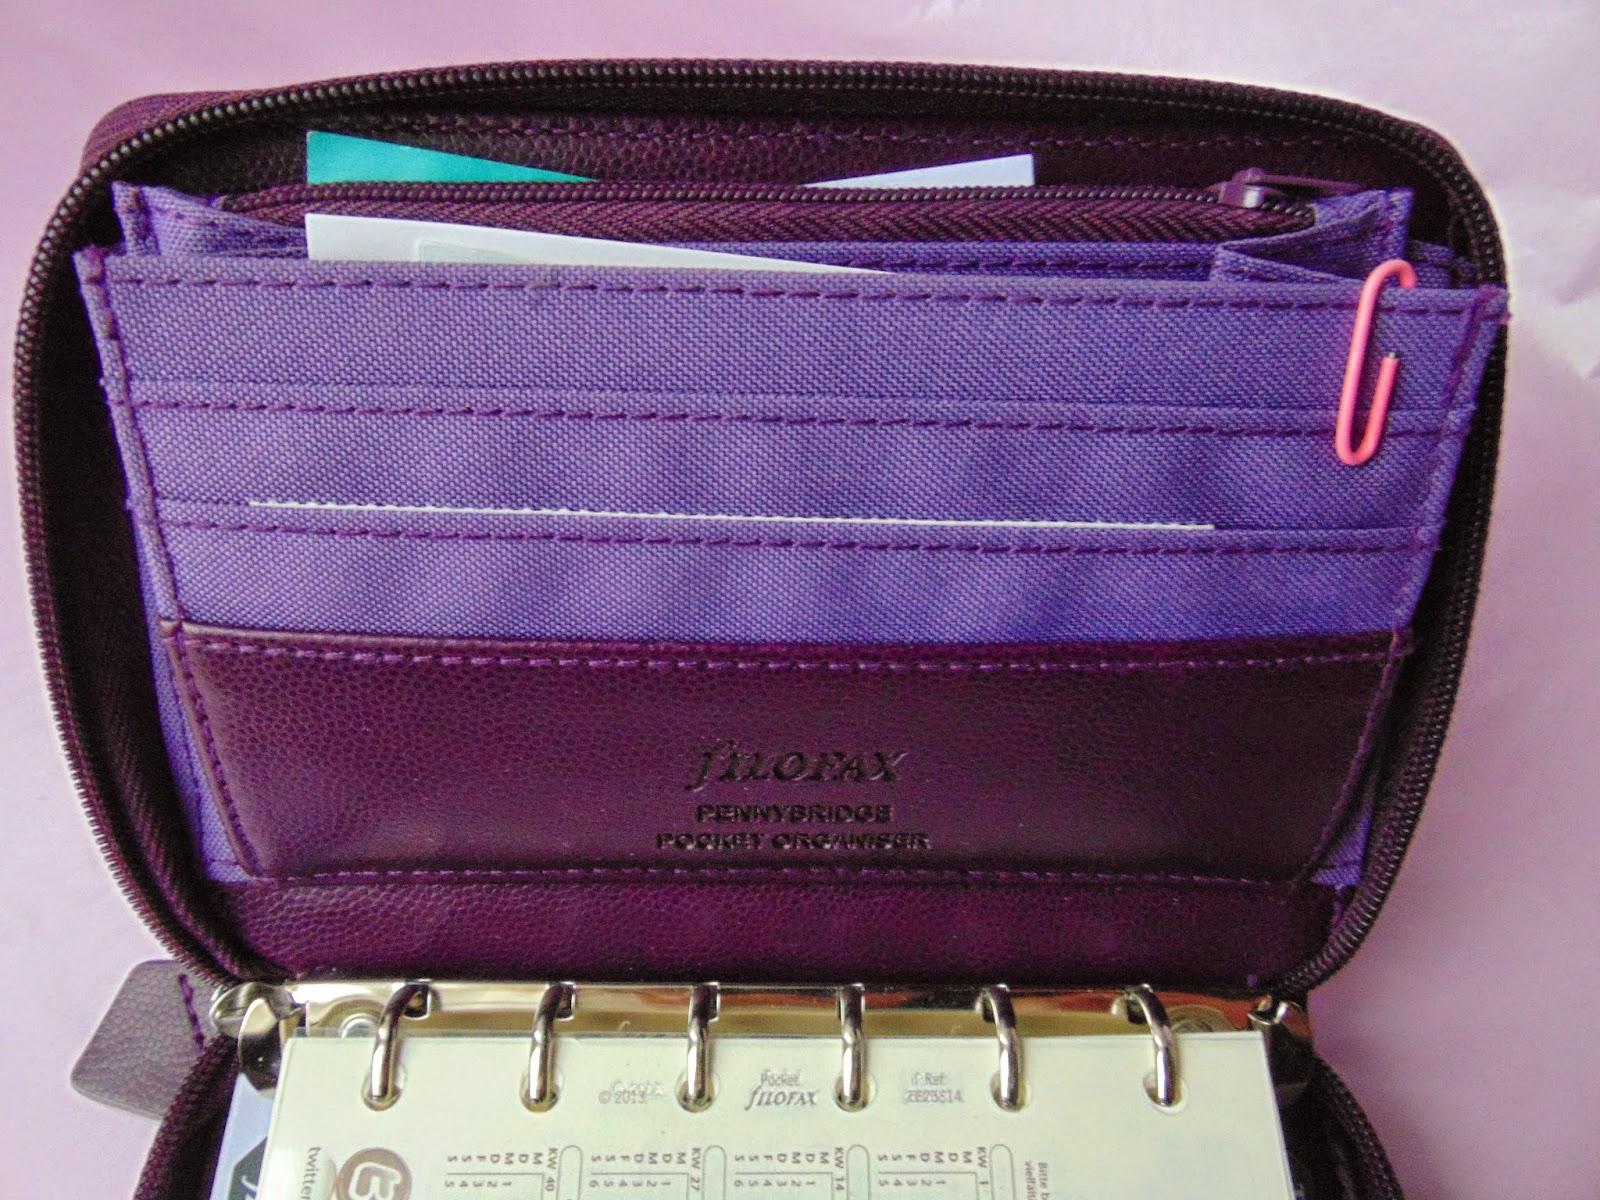 Taschenkalender - Filofax Pennybridge - www.annitschkasblog.de